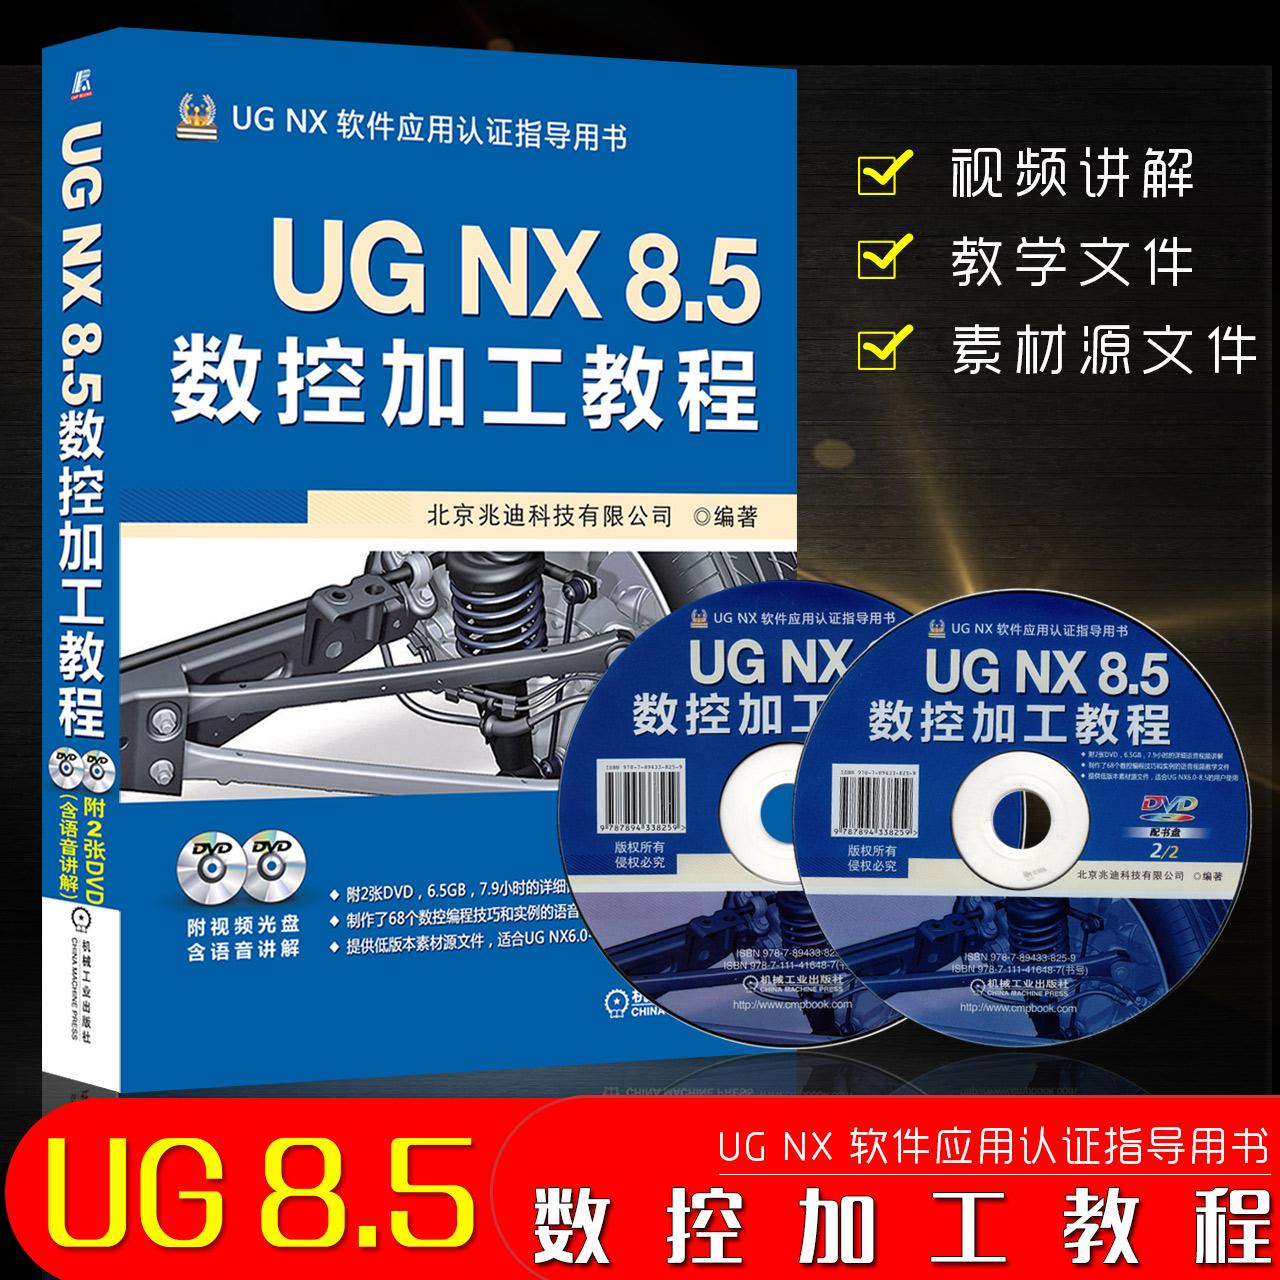 Spot UG NX8 5 CNC machining tutorial books ug CNC machining video tutorial  ug8 5 tutorial ug programming tutorial books UGNX 8 5 CNC machining